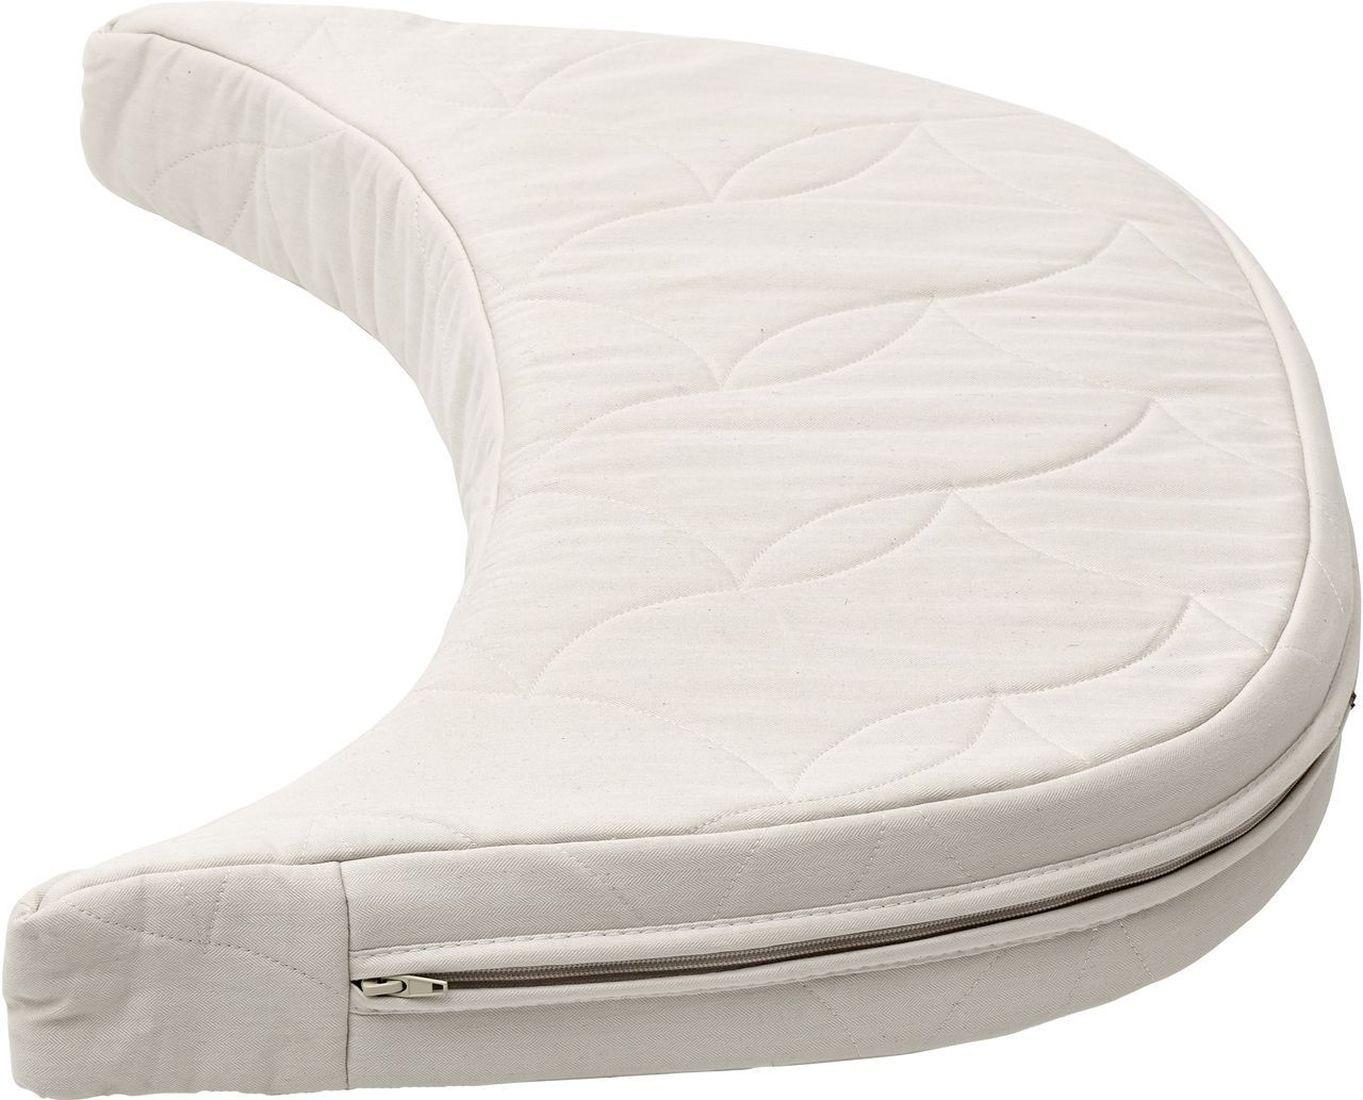 matratzen fu st tze organic leander kleine fabriek. Black Bedroom Furniture Sets. Home Design Ideas